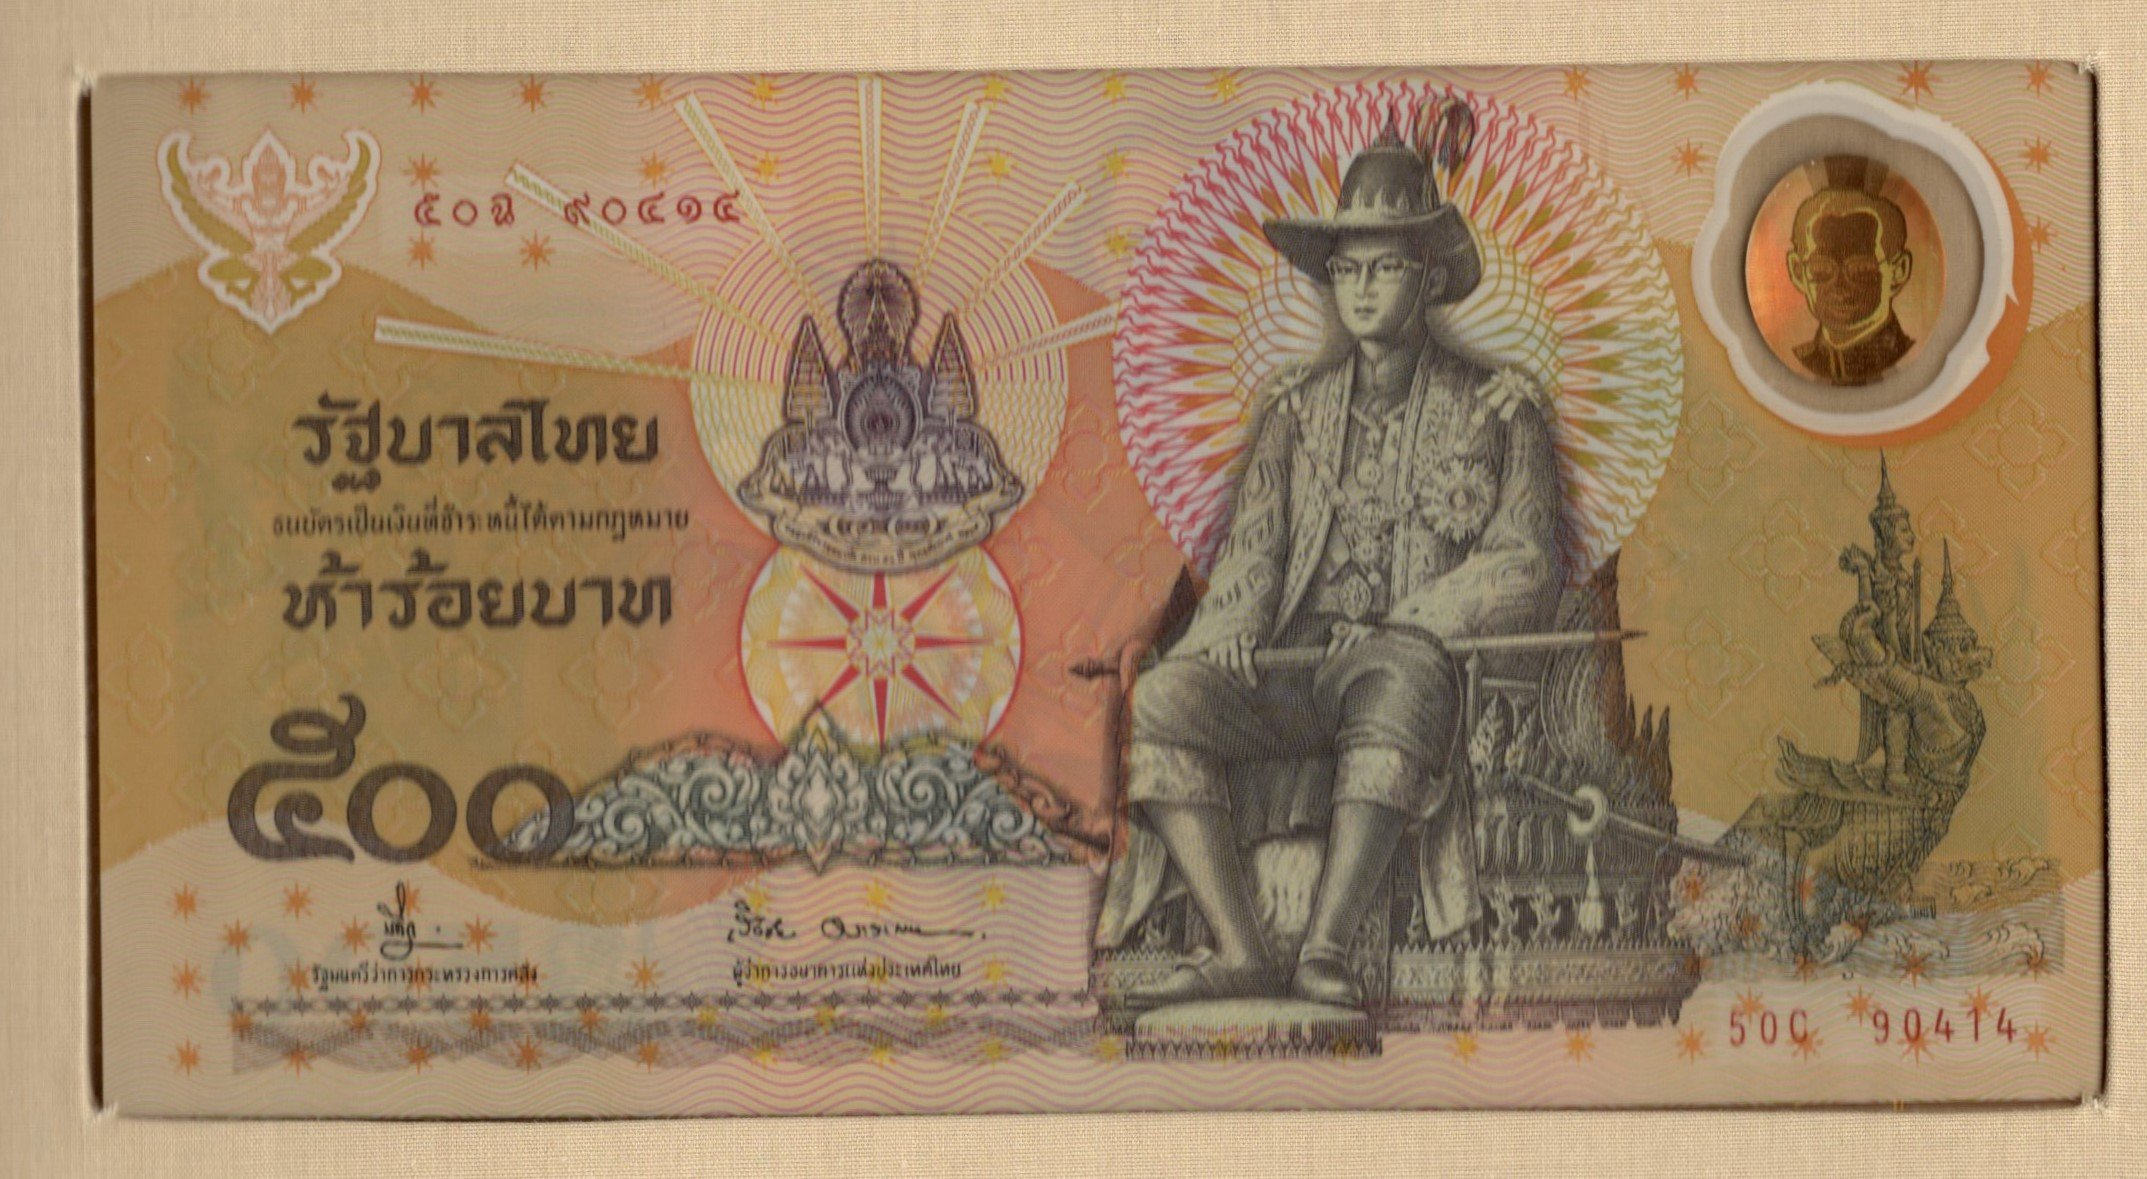 thailand 500 baht